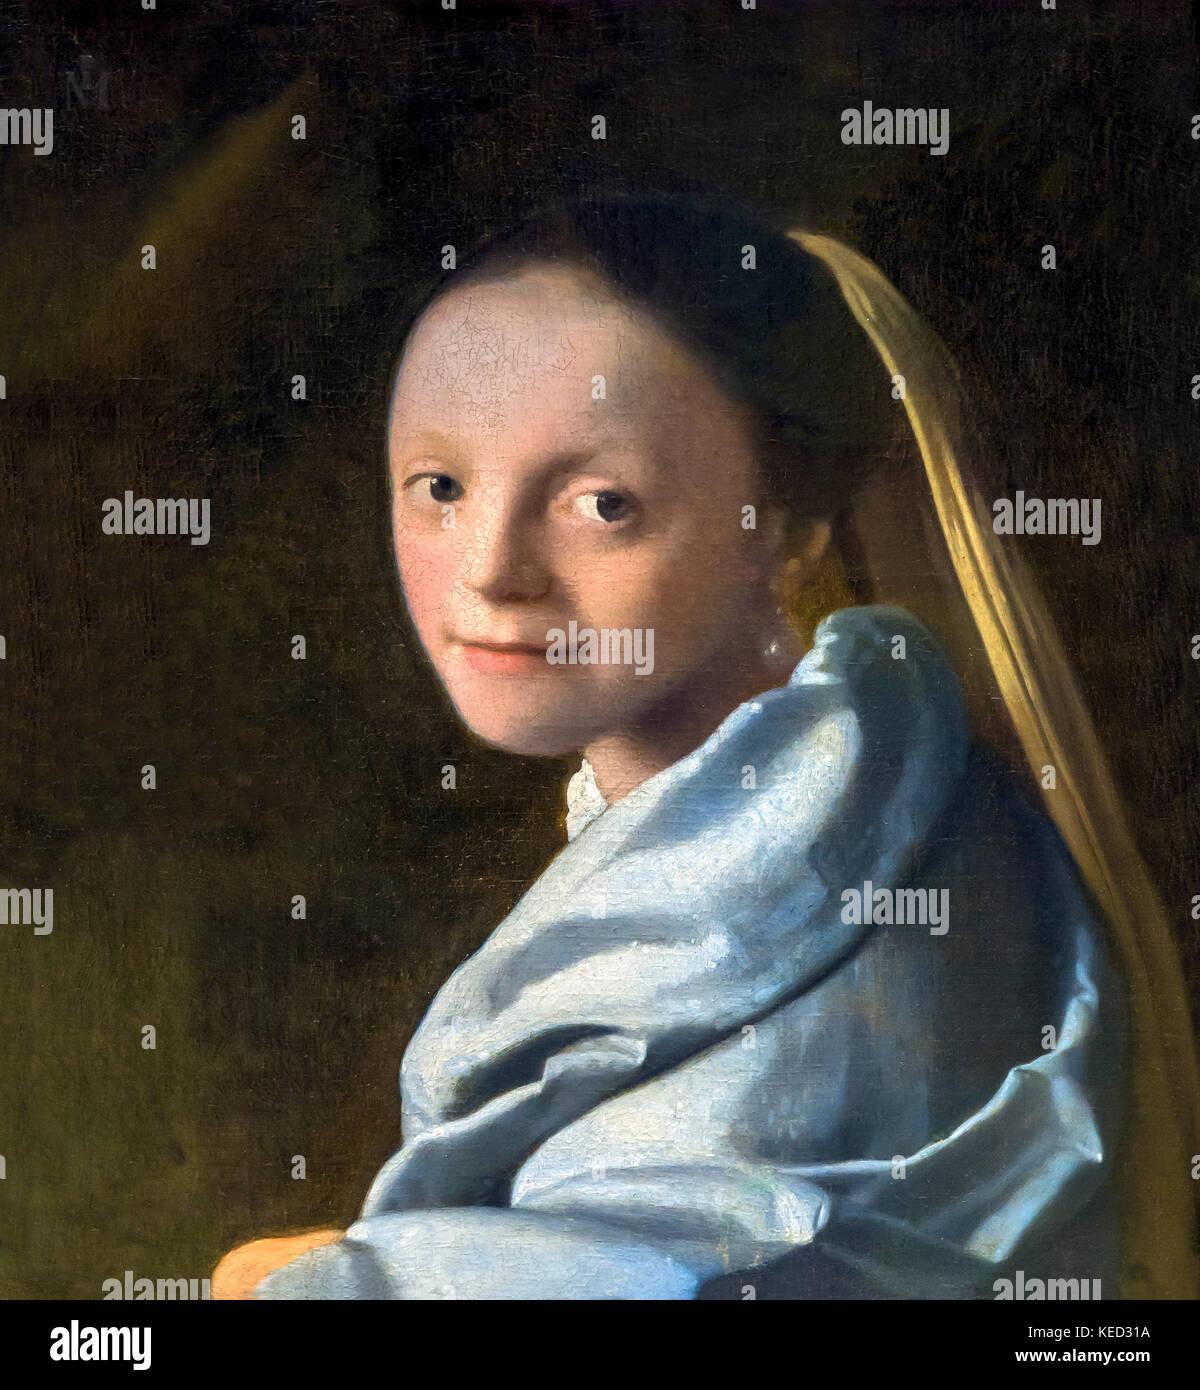 Étude d'une jeune femme, Johannes Vermeer, vers 1665-1667, Metropolitan Museum of Art, Manhattan, New York Photo Stock